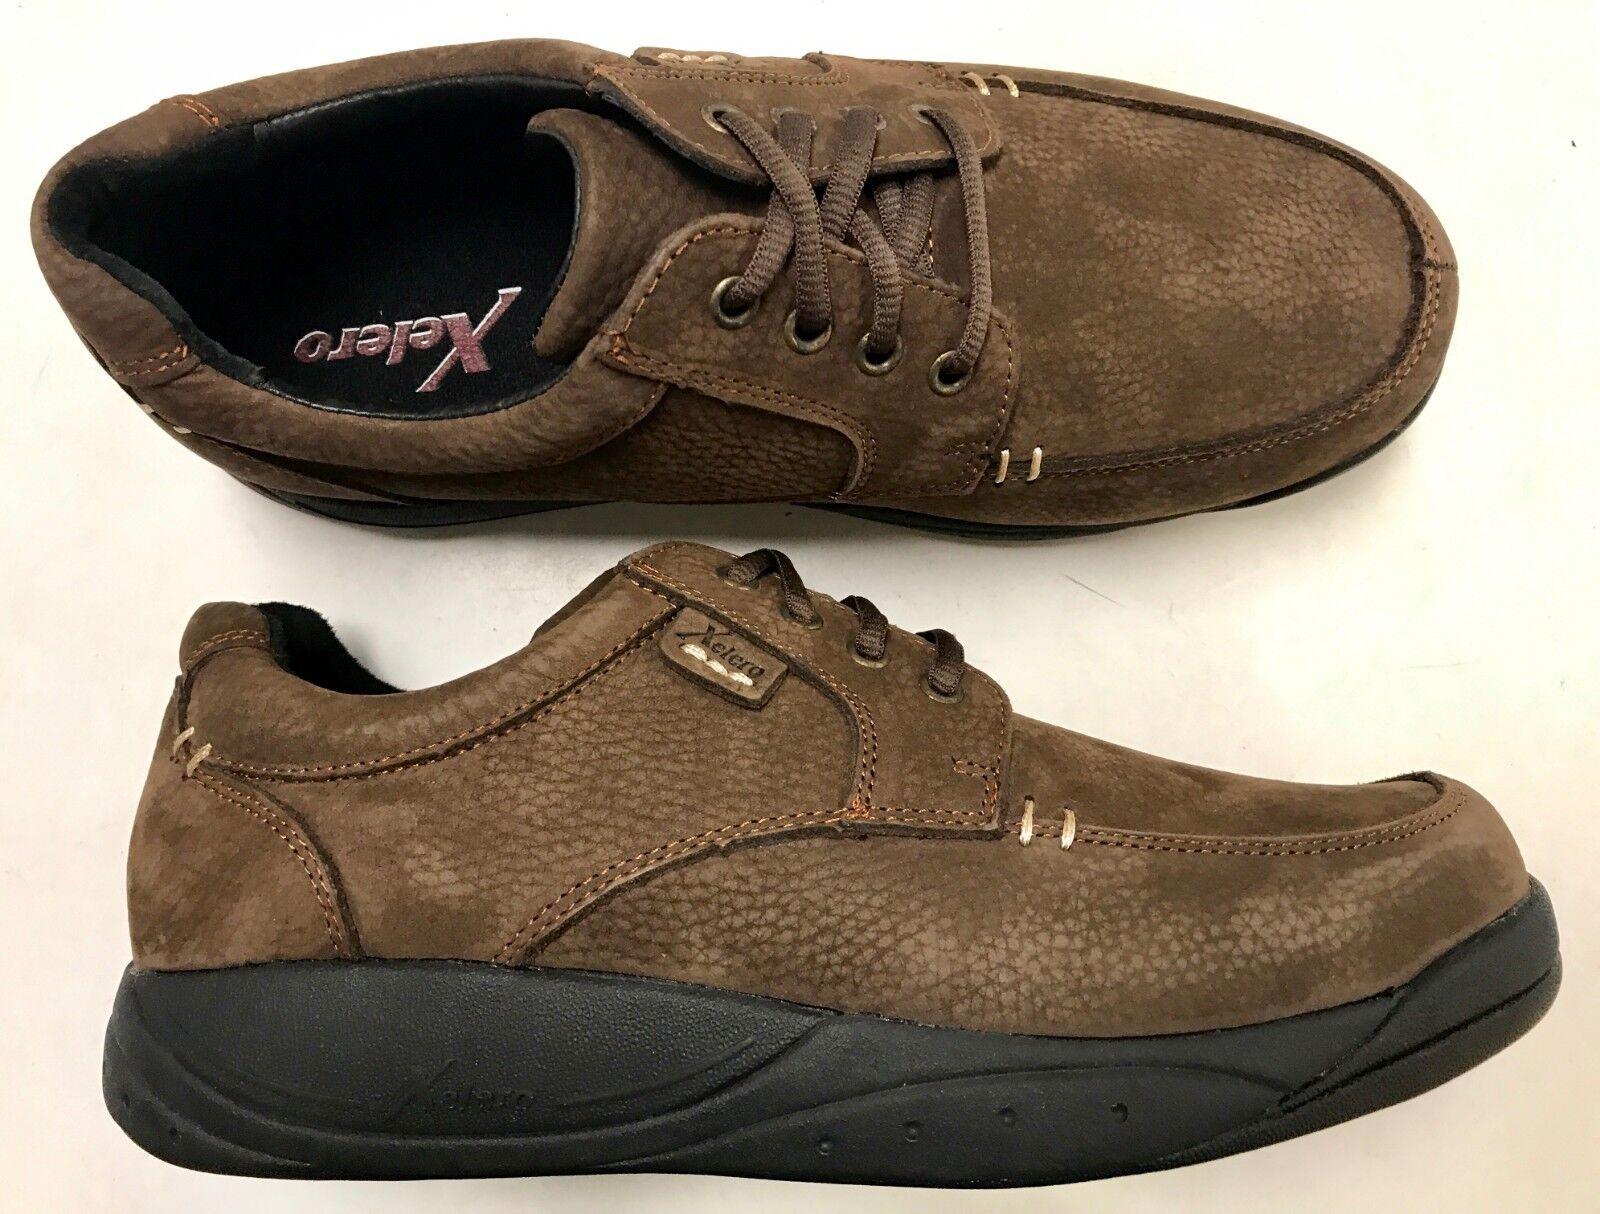 XELERO  LONDON  Men's Orthopedic Extra Depth Slip Resistant Brown Leather shoes